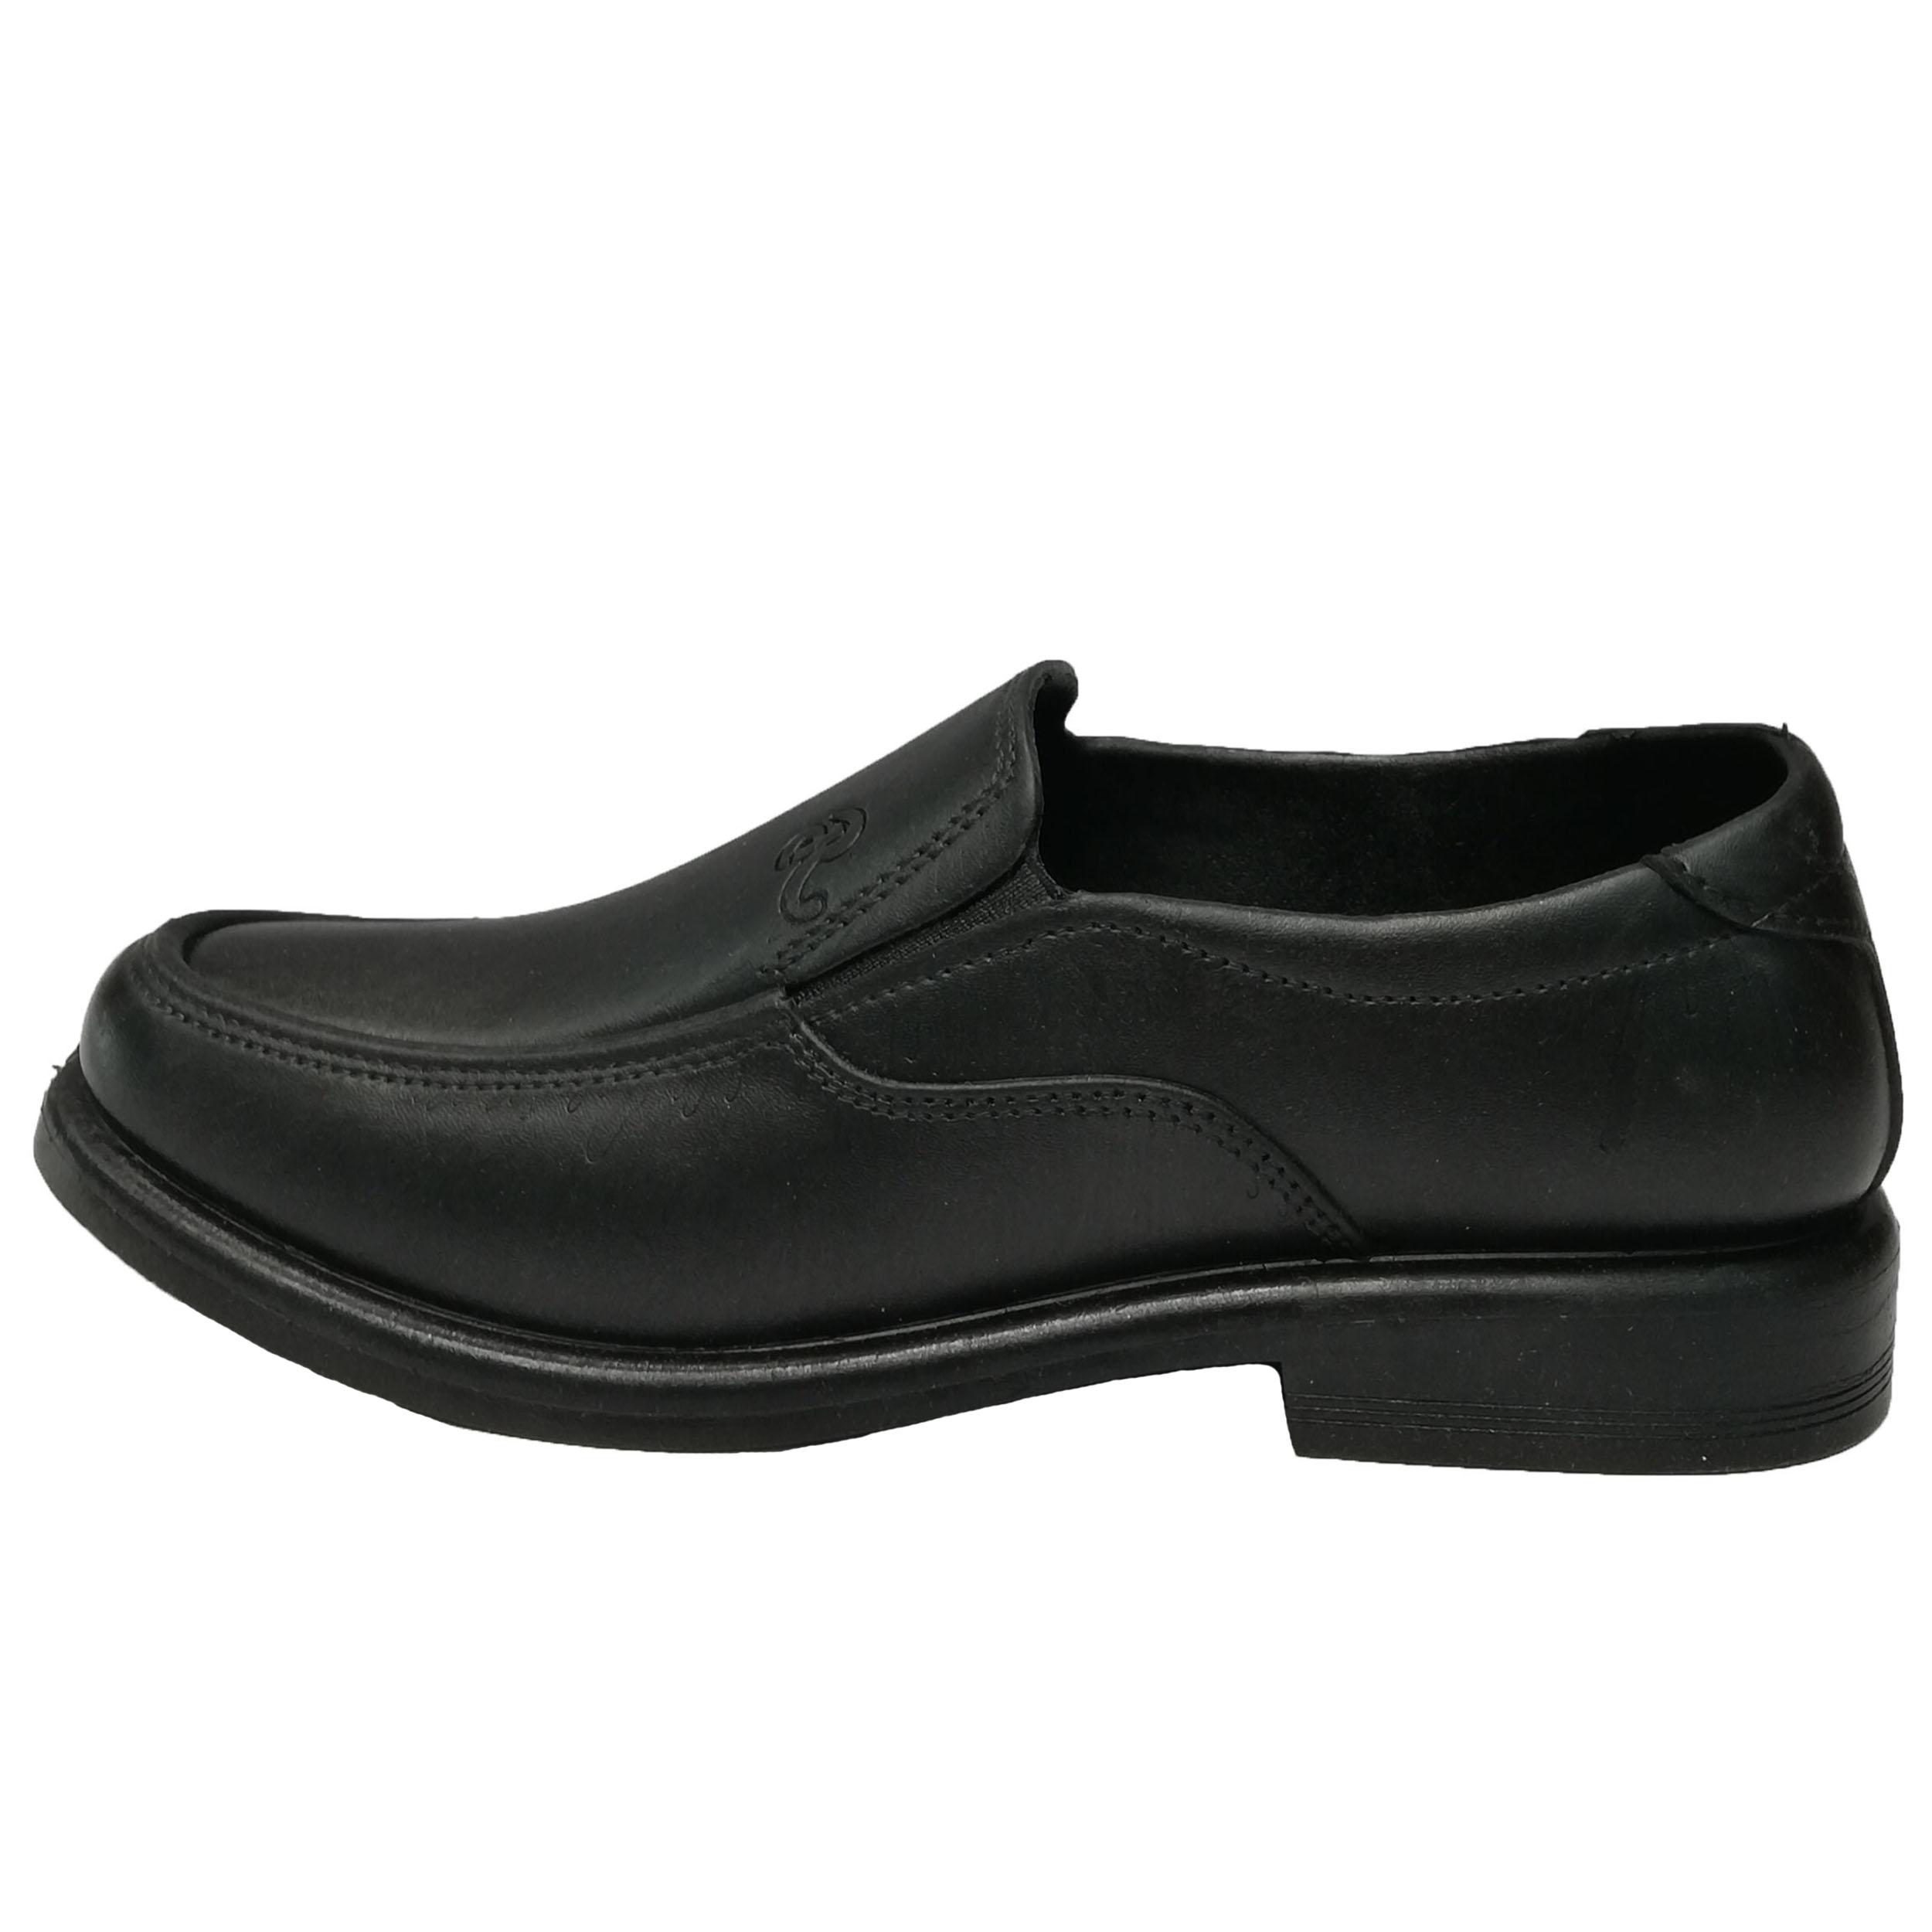 کفش مردانه مدل M-1002-BL